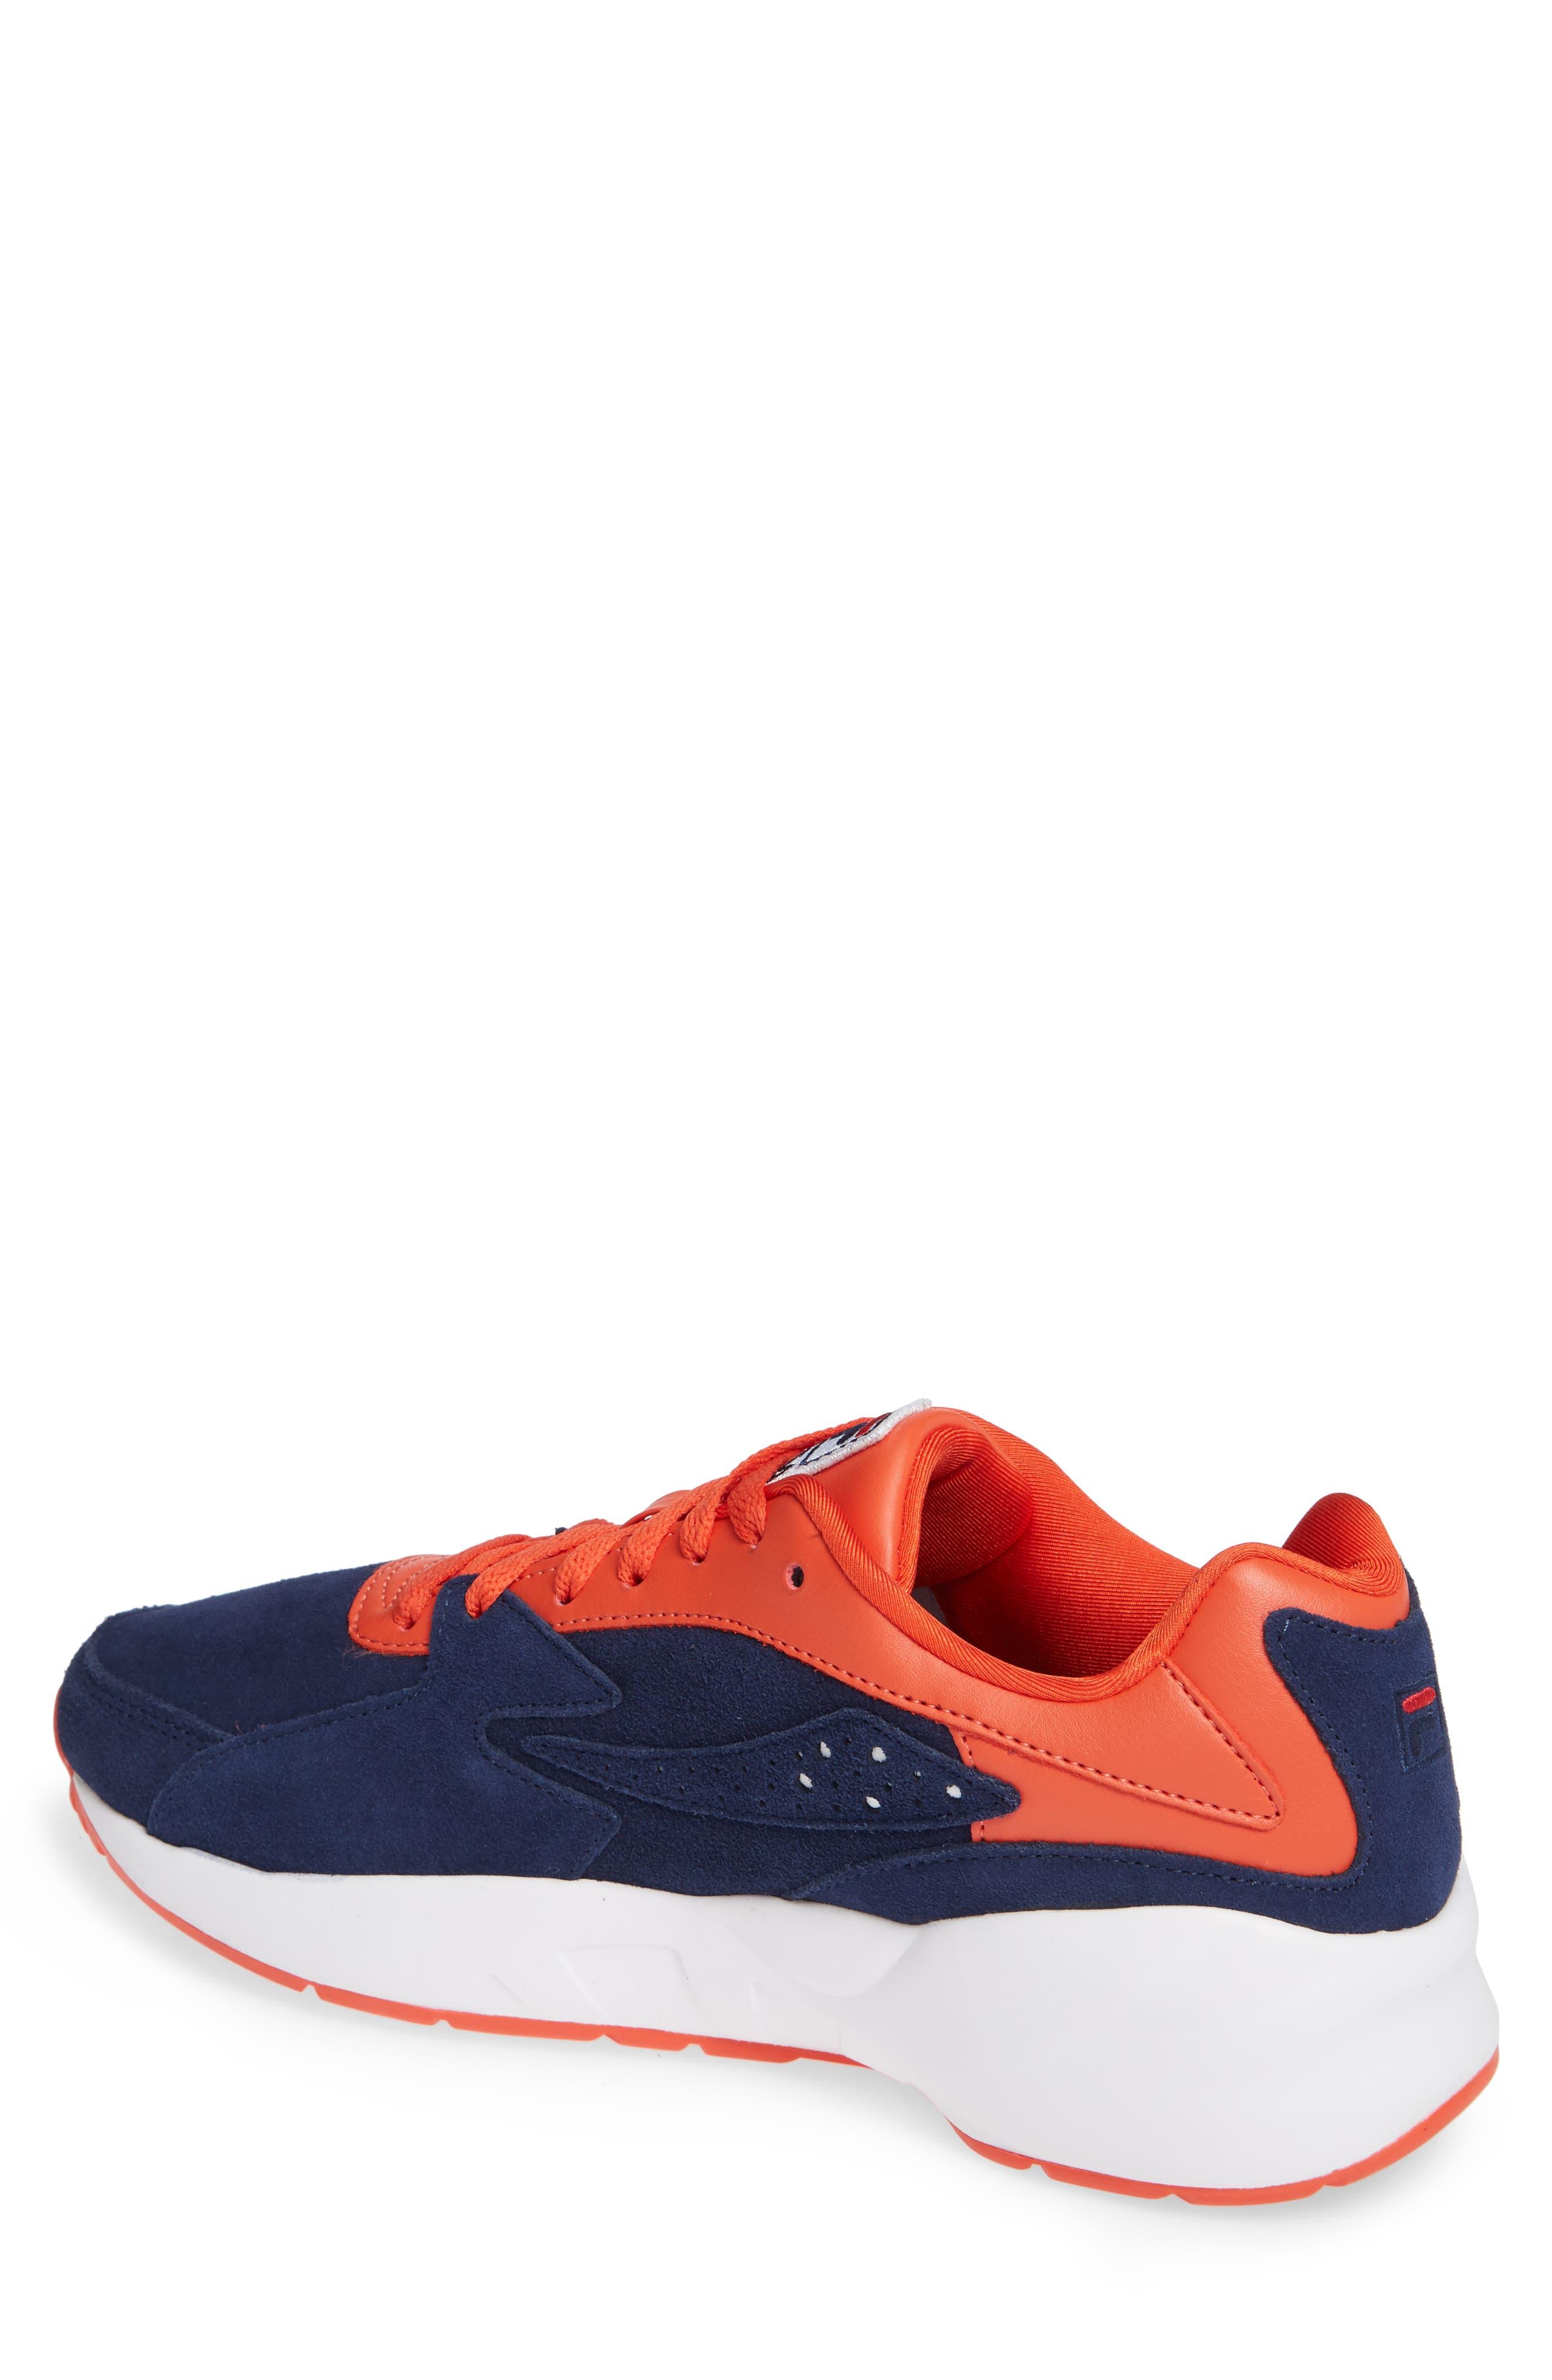 Mindblower Sneaker,                             Alternate thumbnail 2, color,                             NAVY/ WHITE/ RED